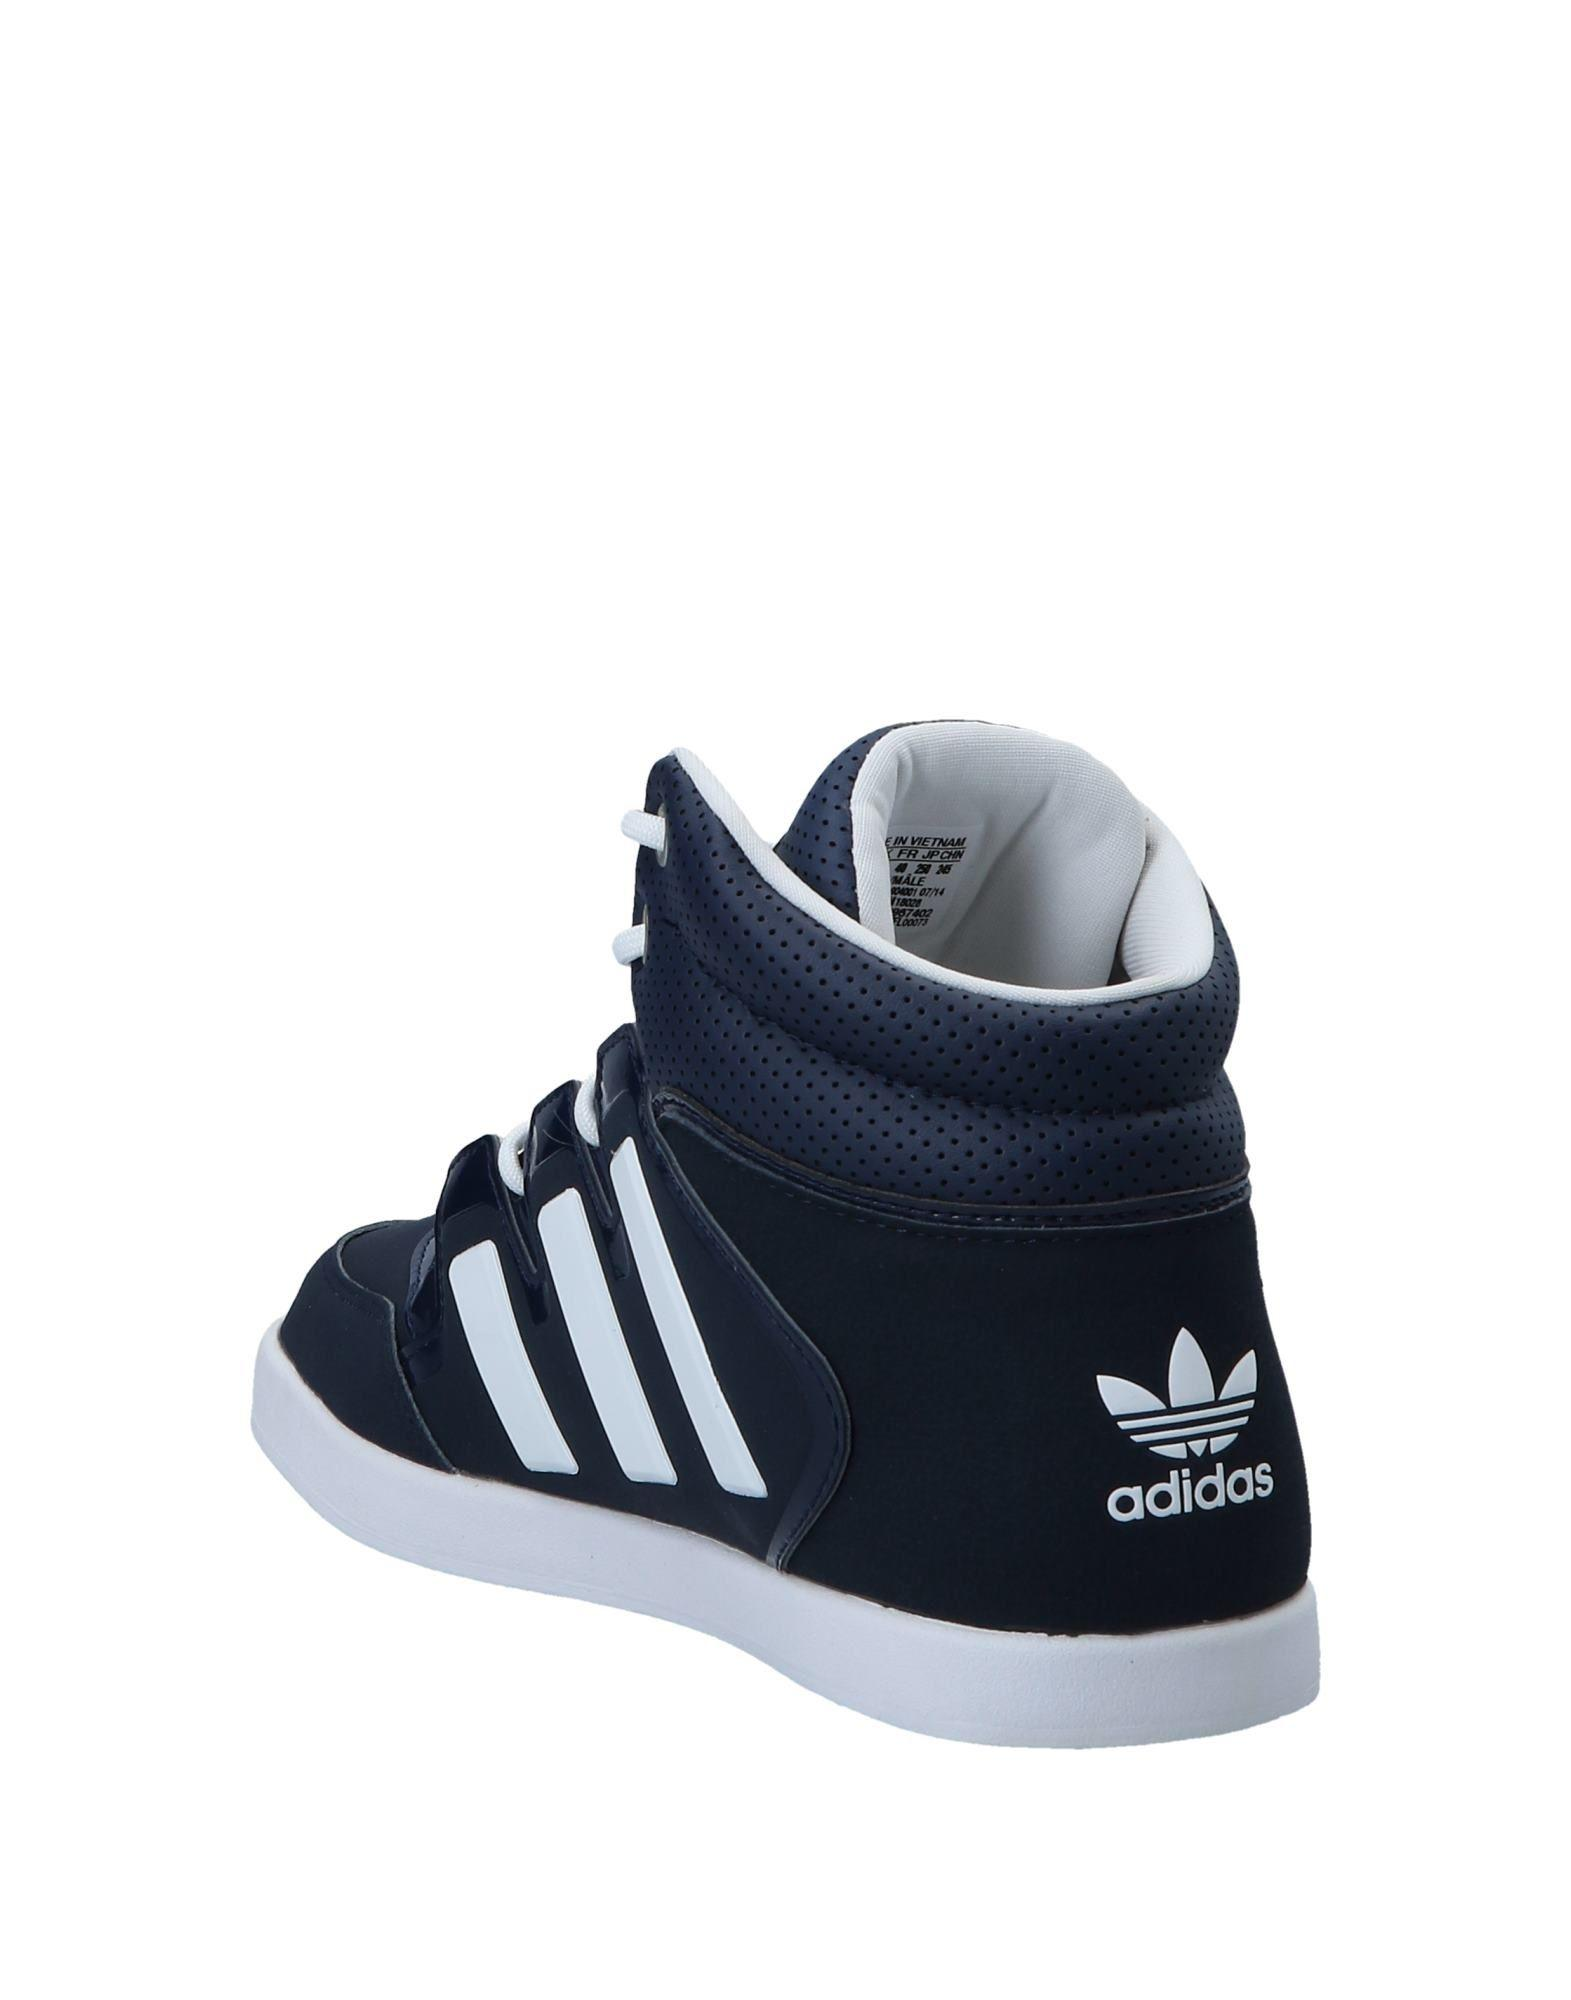 high top sneakers dames adidas,high top sneakers dames